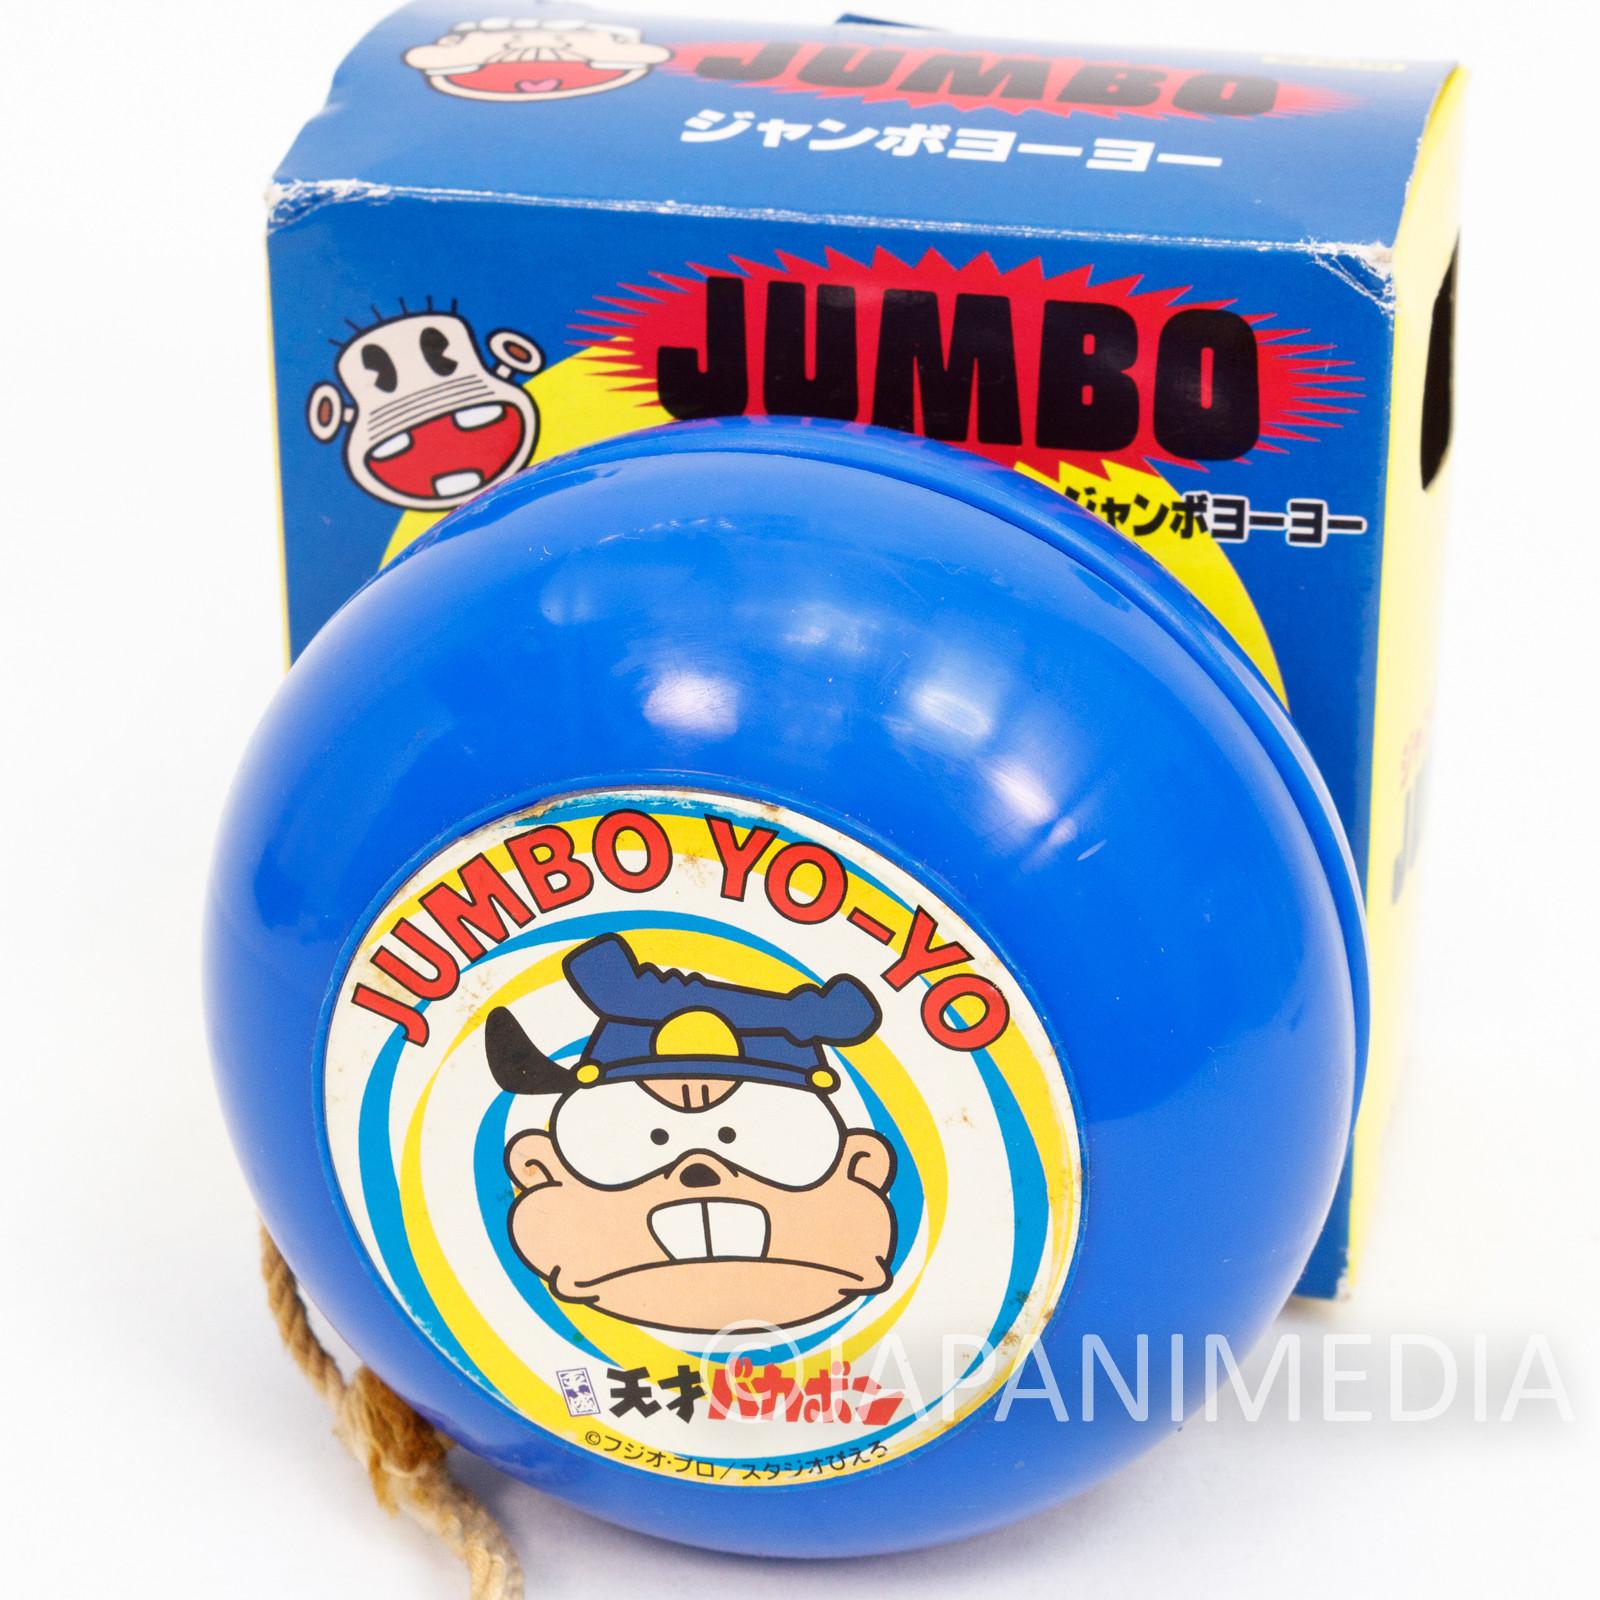 Genius Tensai Bakabon Police Officer Jumbo Plastic Yoyo Toy Fujio Akatsuka JAPAN